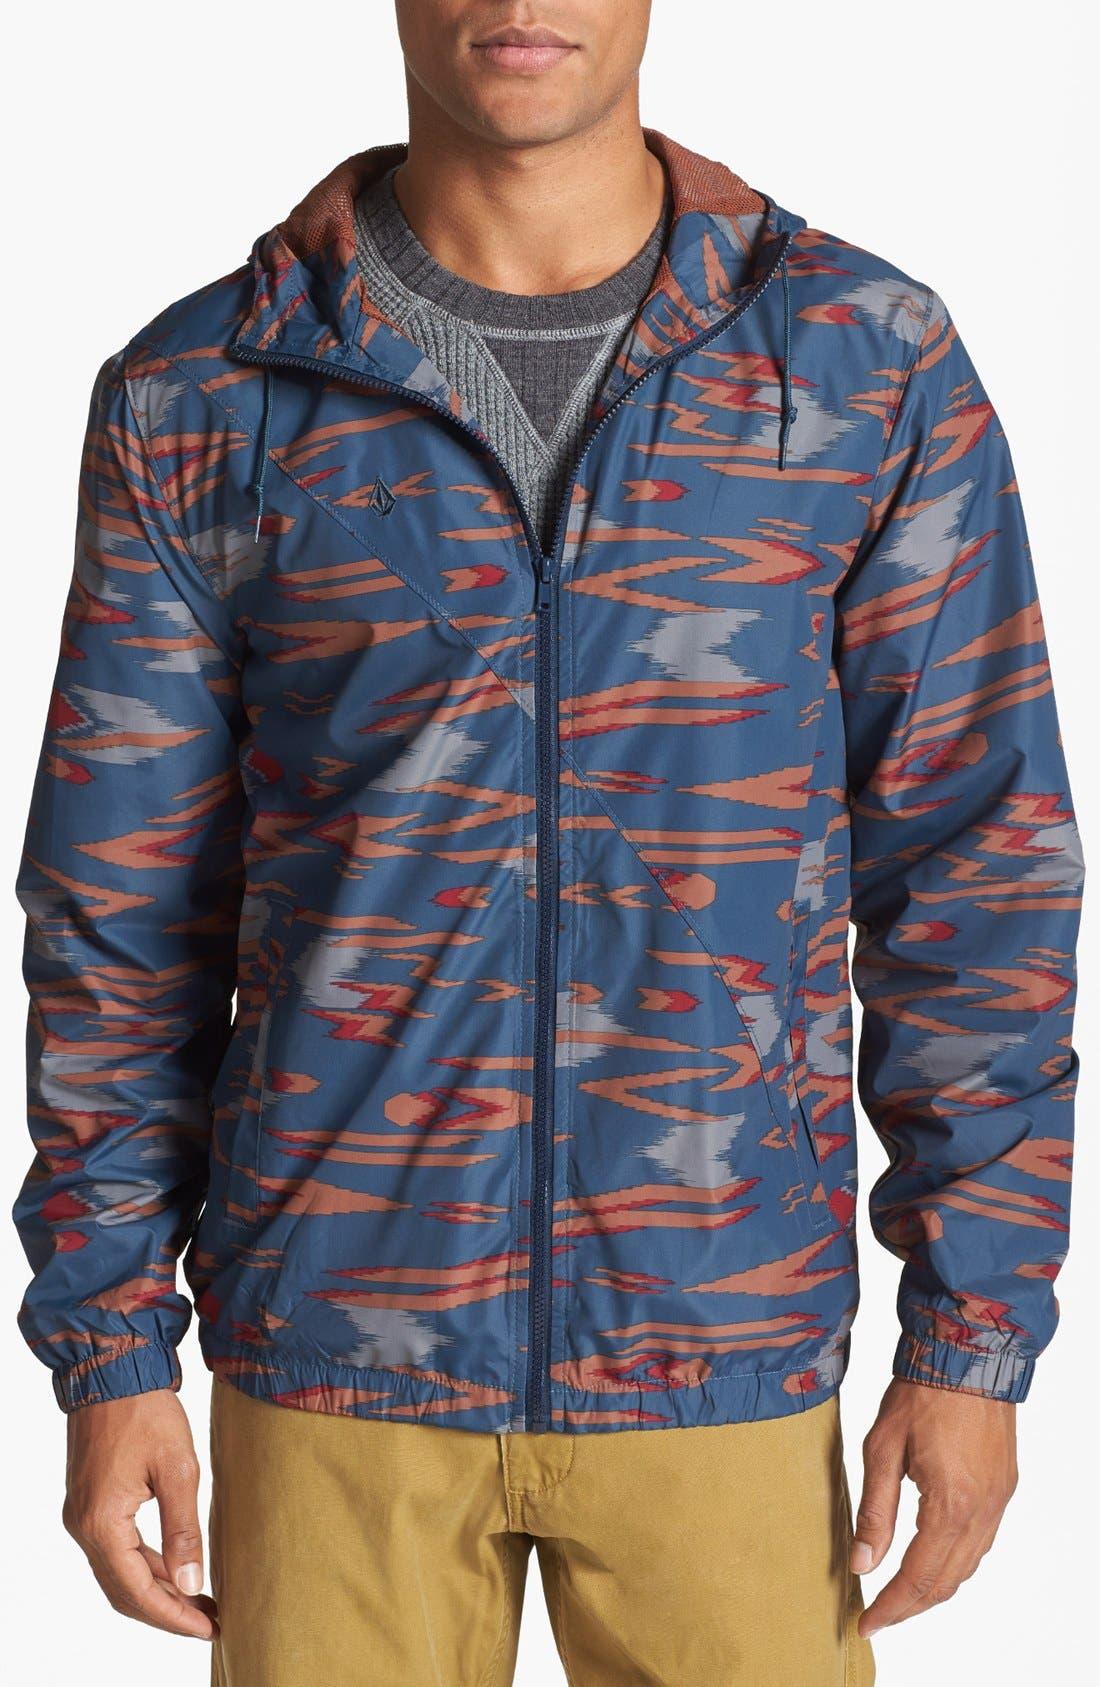 Alternate Image 1 Selected - Volcom 'Forwarder' Windbreaker Jacket